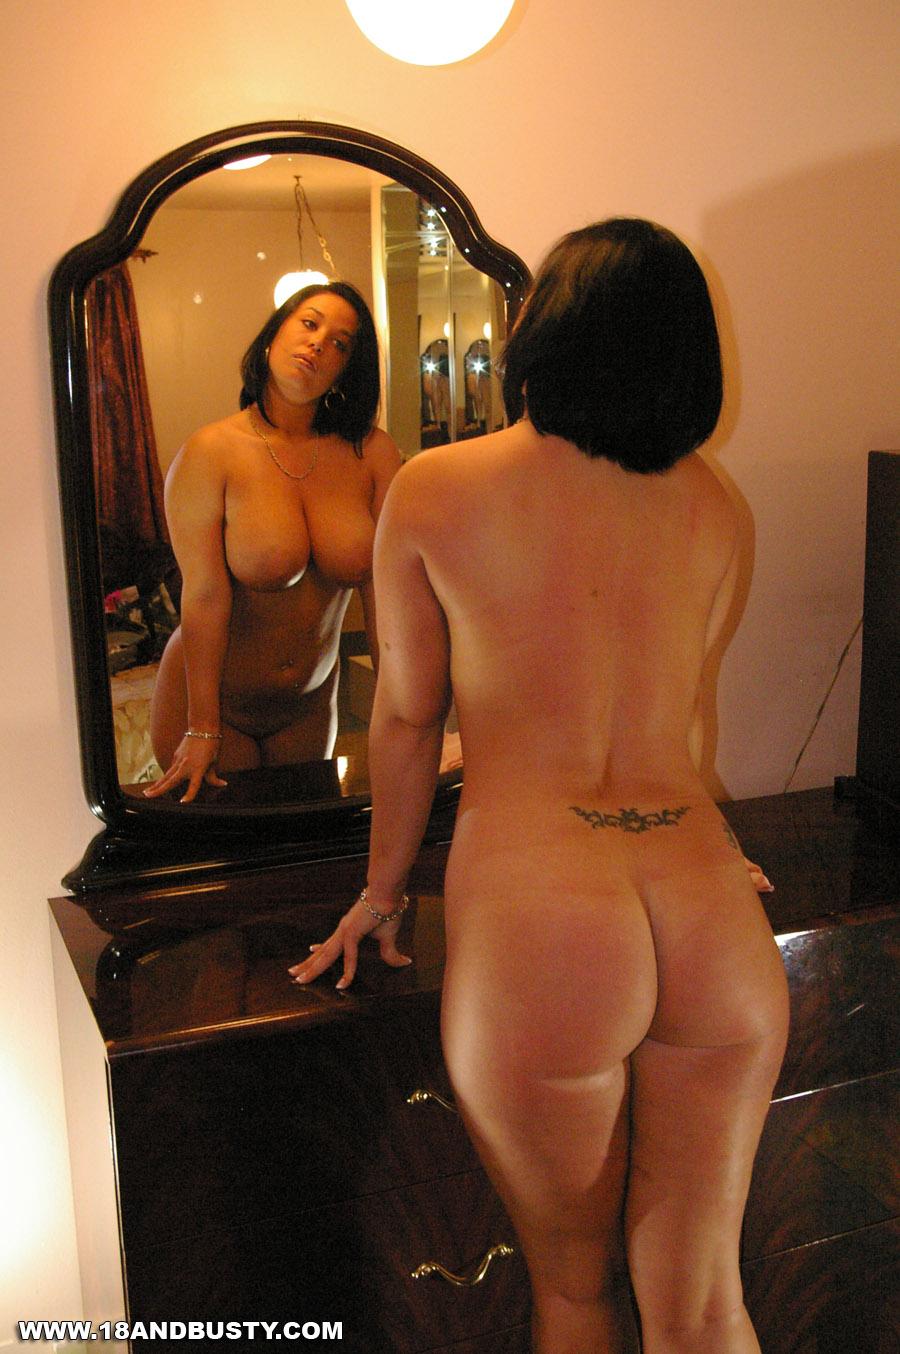 Weman nude pics at walmart